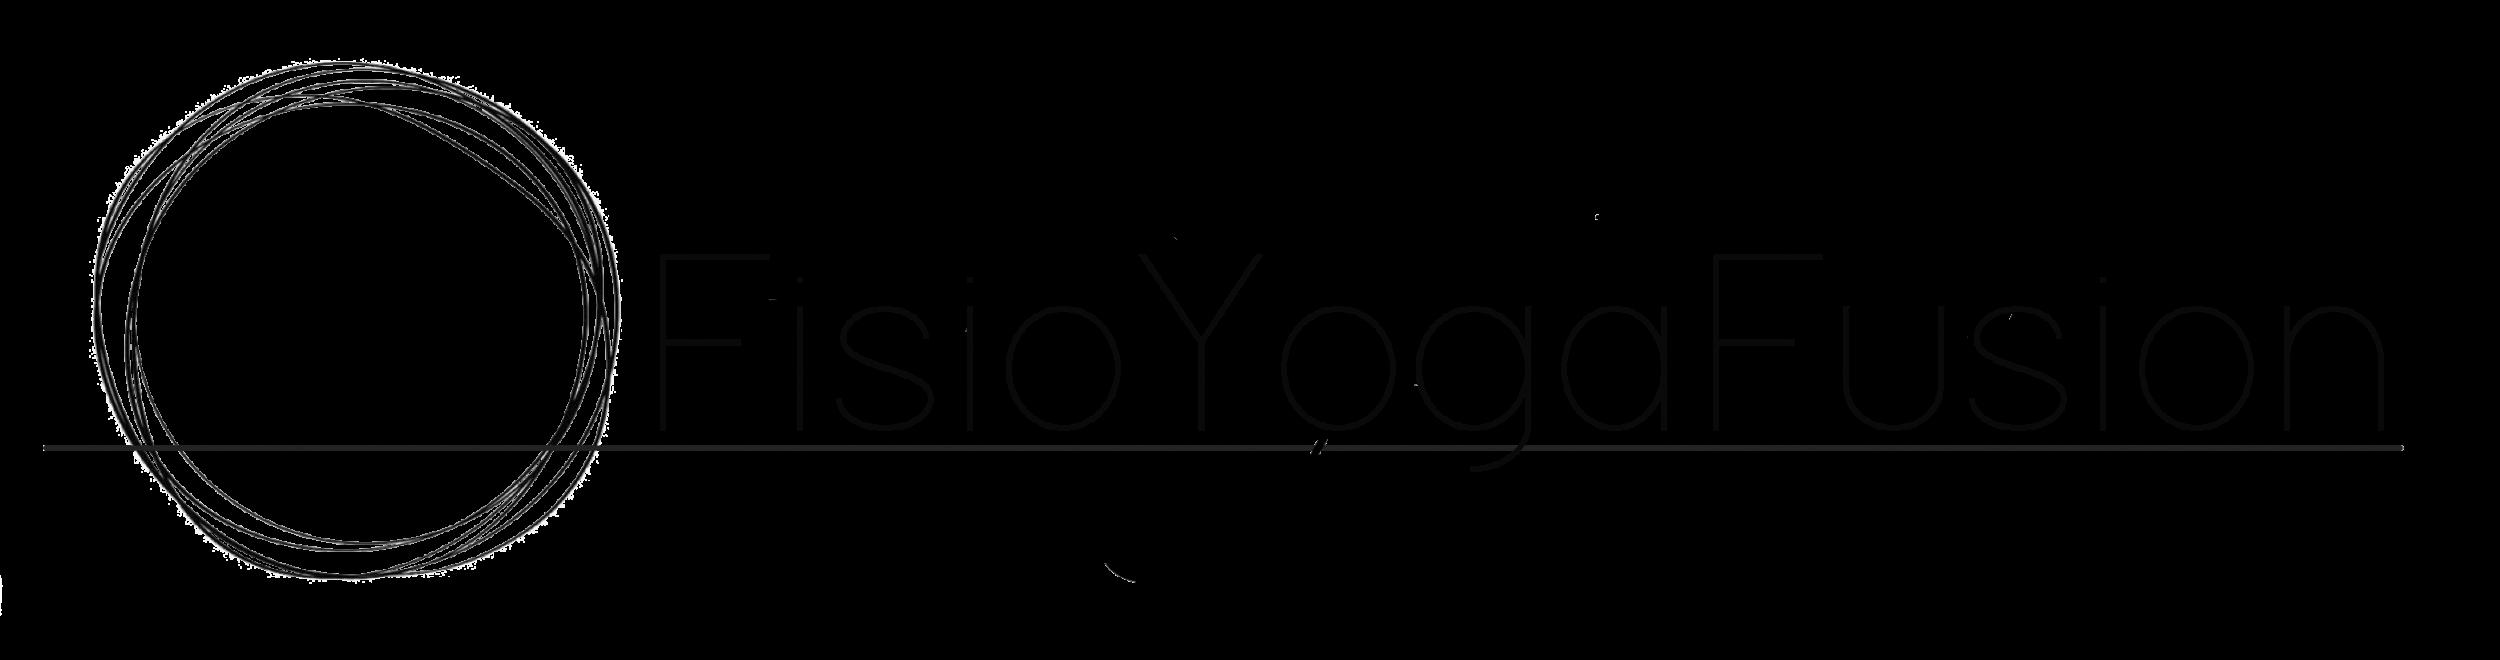 FisioYogaFusion